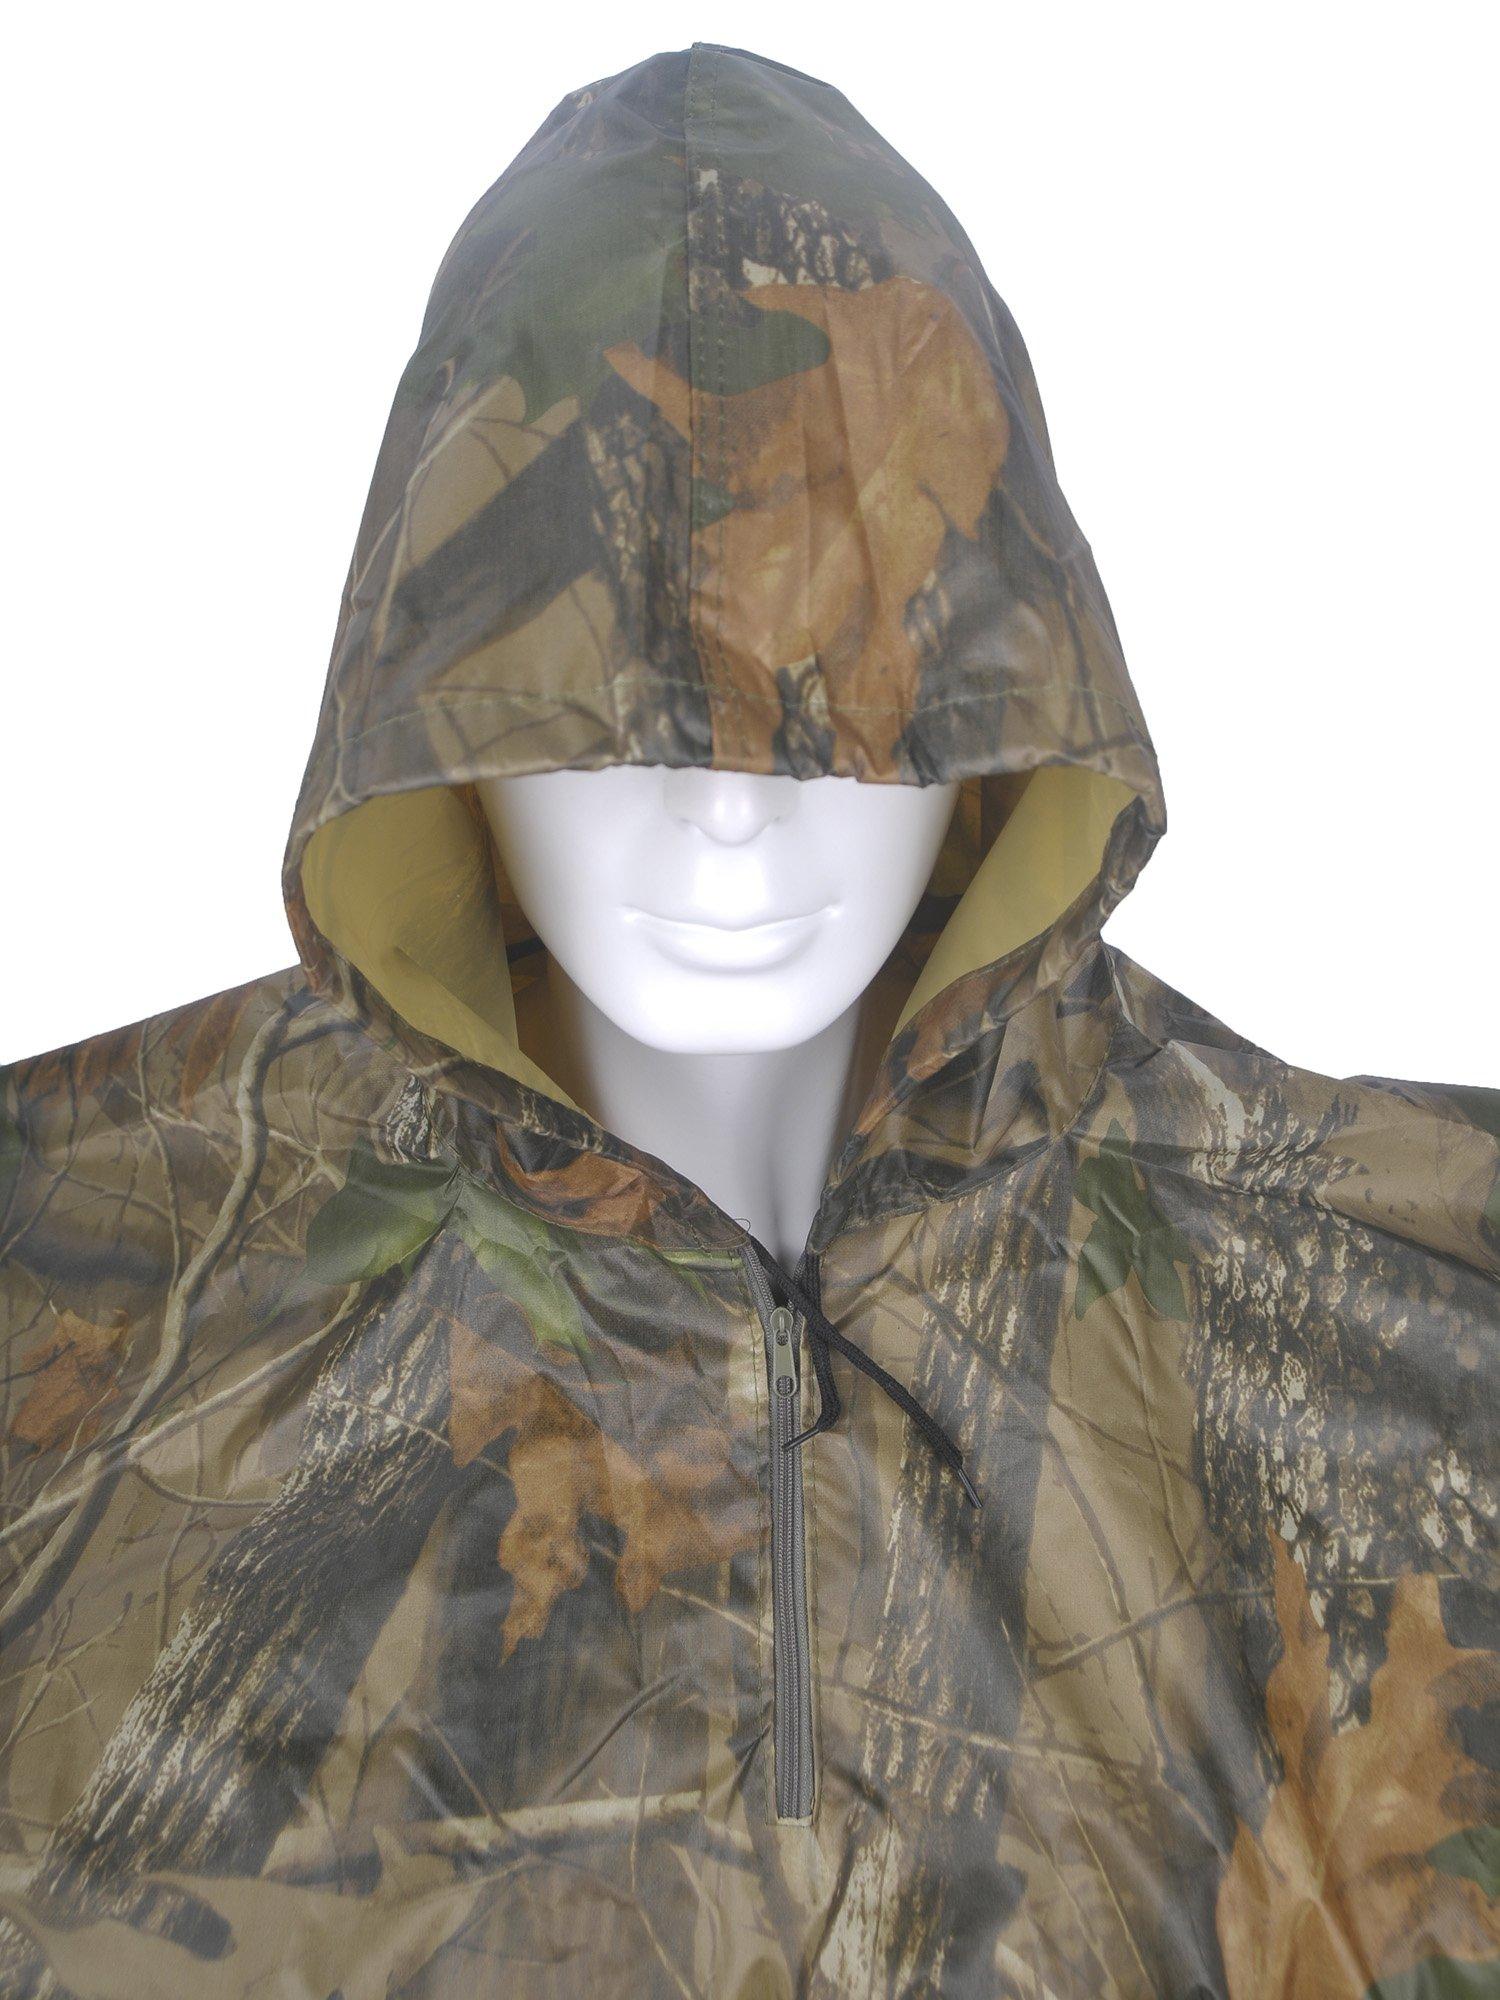 Rain Poncho, LOOGU Waterproof Camouflage Rain Coat Outdoor Camo Shelter Ground Sheet by Rain Poncho (Image #6)